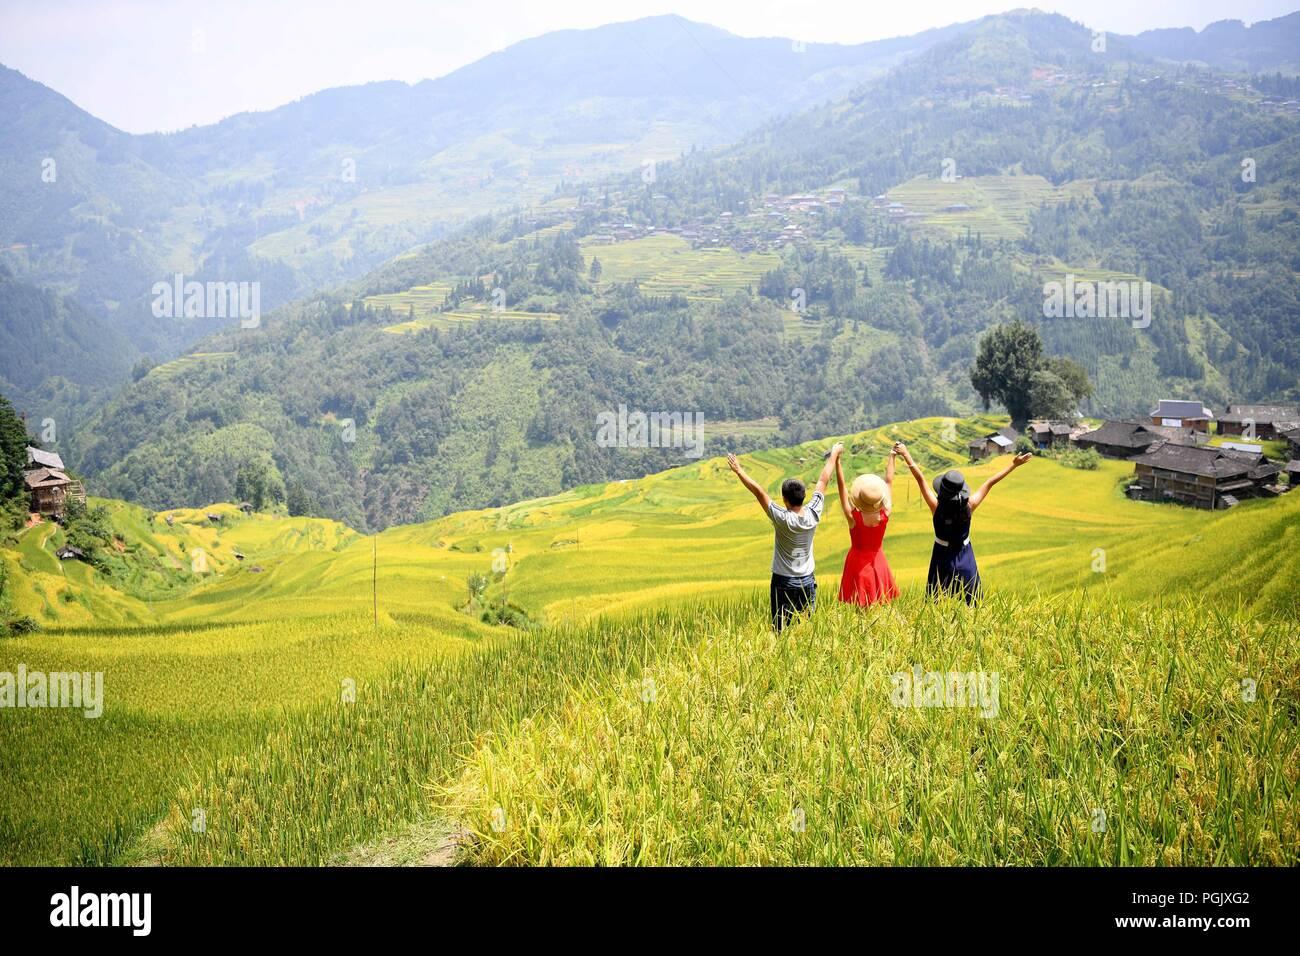 Congjiang, Congjiang, China. 27th Aug, 2018. Congjiang, CHINA-Terraced fields can be seen in Congjiang, southwest China's Guizhou Province. Credit: SIPA Asia/ZUMA Wire/Alamy Live News - Stock Image